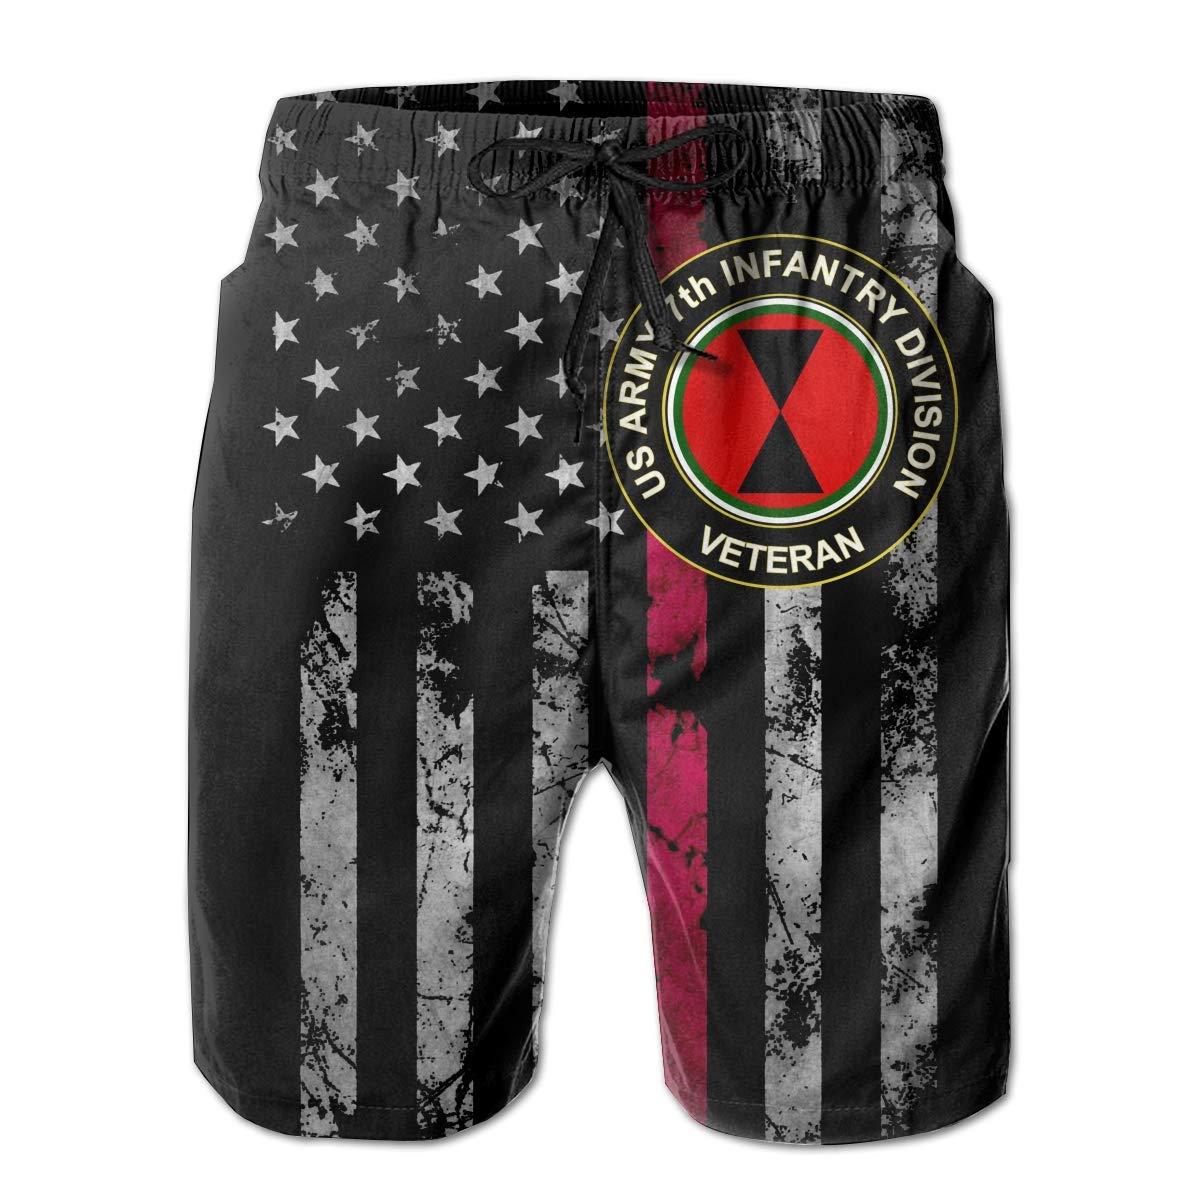 US Army 7th Infantry Division Veteran Mens Beach Shorts Swim Trunks Casual Shorts Sports Shorts